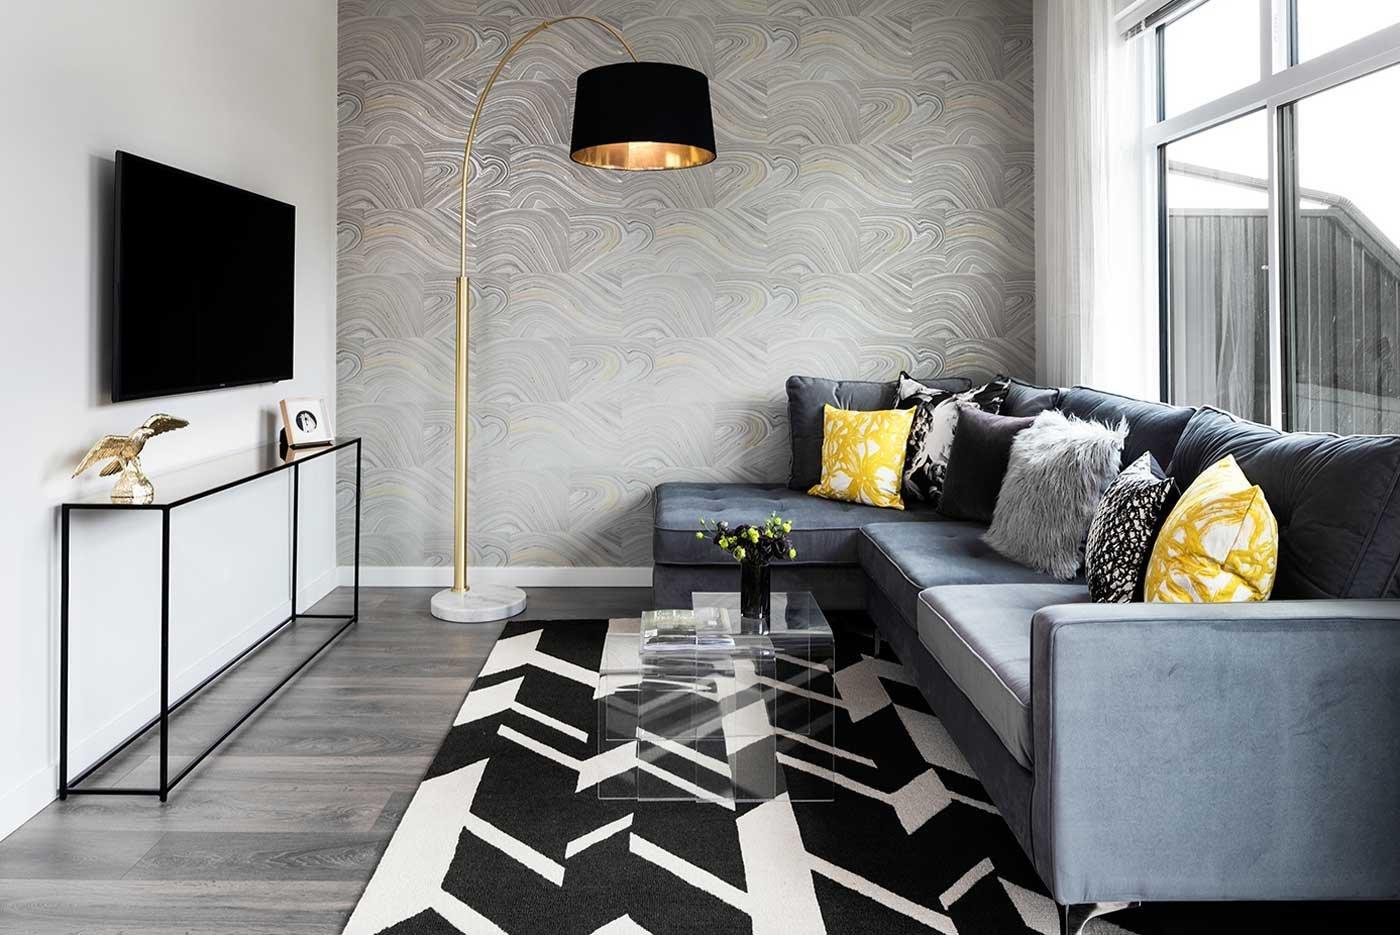 Living Area - 18505 Laurensen Place, Surrey, BC V4N 6R7, Canada!